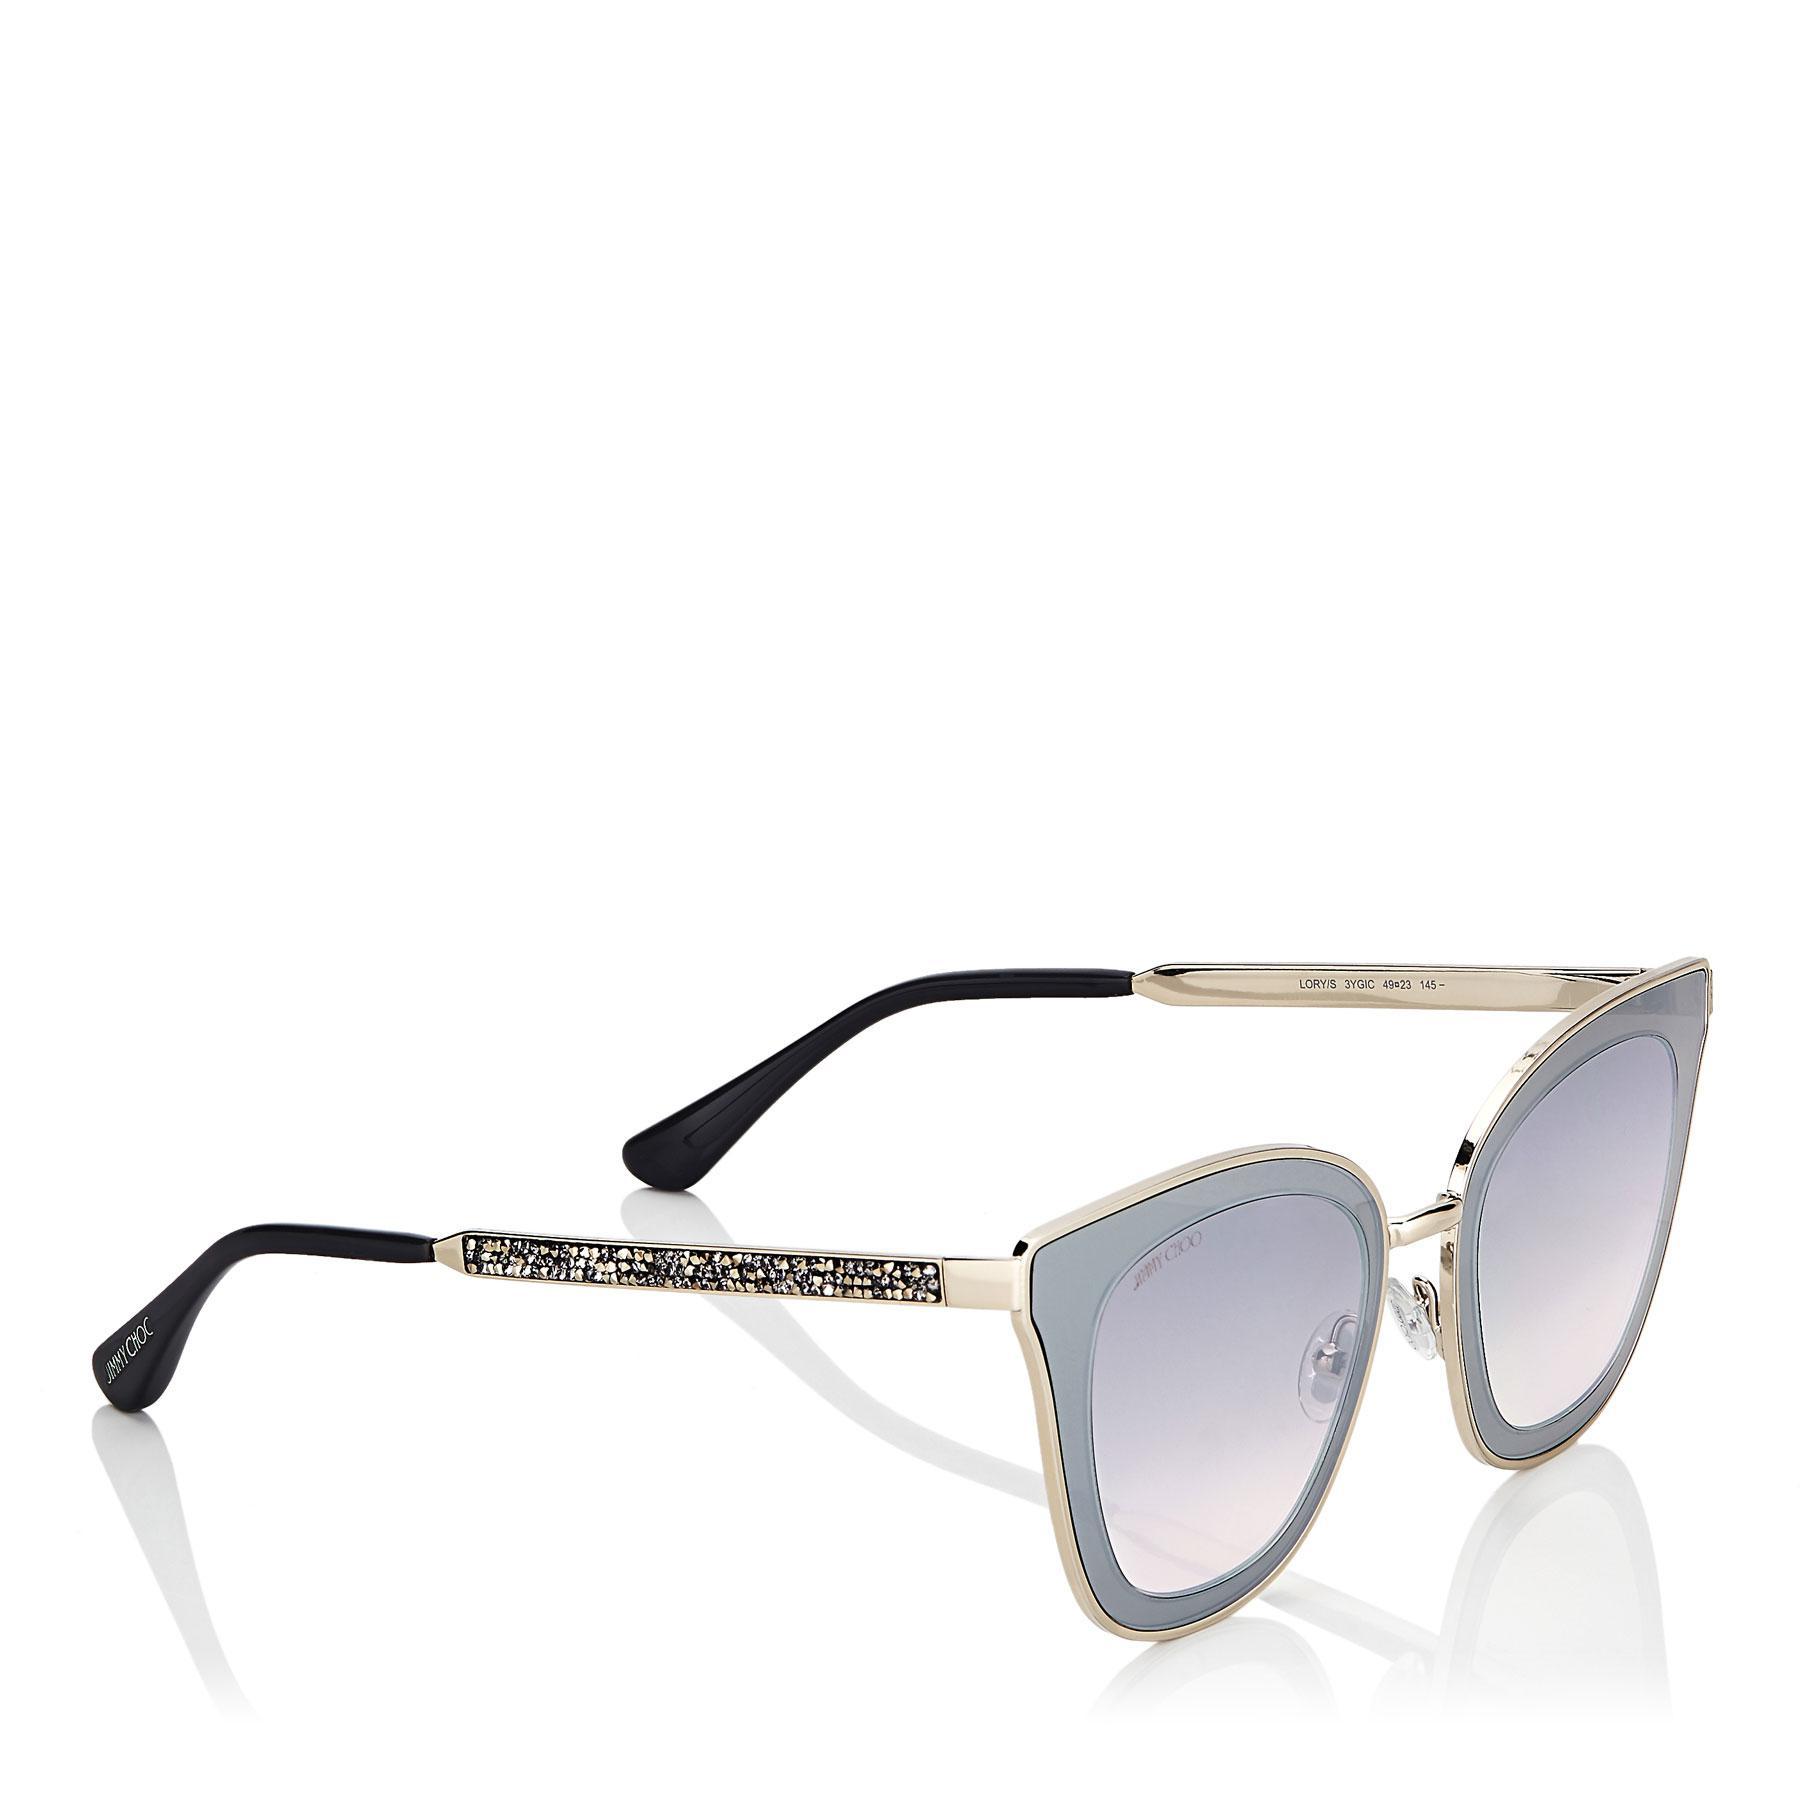 1141c3c2b77 Jimmy Choo - Metallic Lory Light Gold Cat-eye Sunglasses With Mirror Lenses  - Lyst. View fullscreen